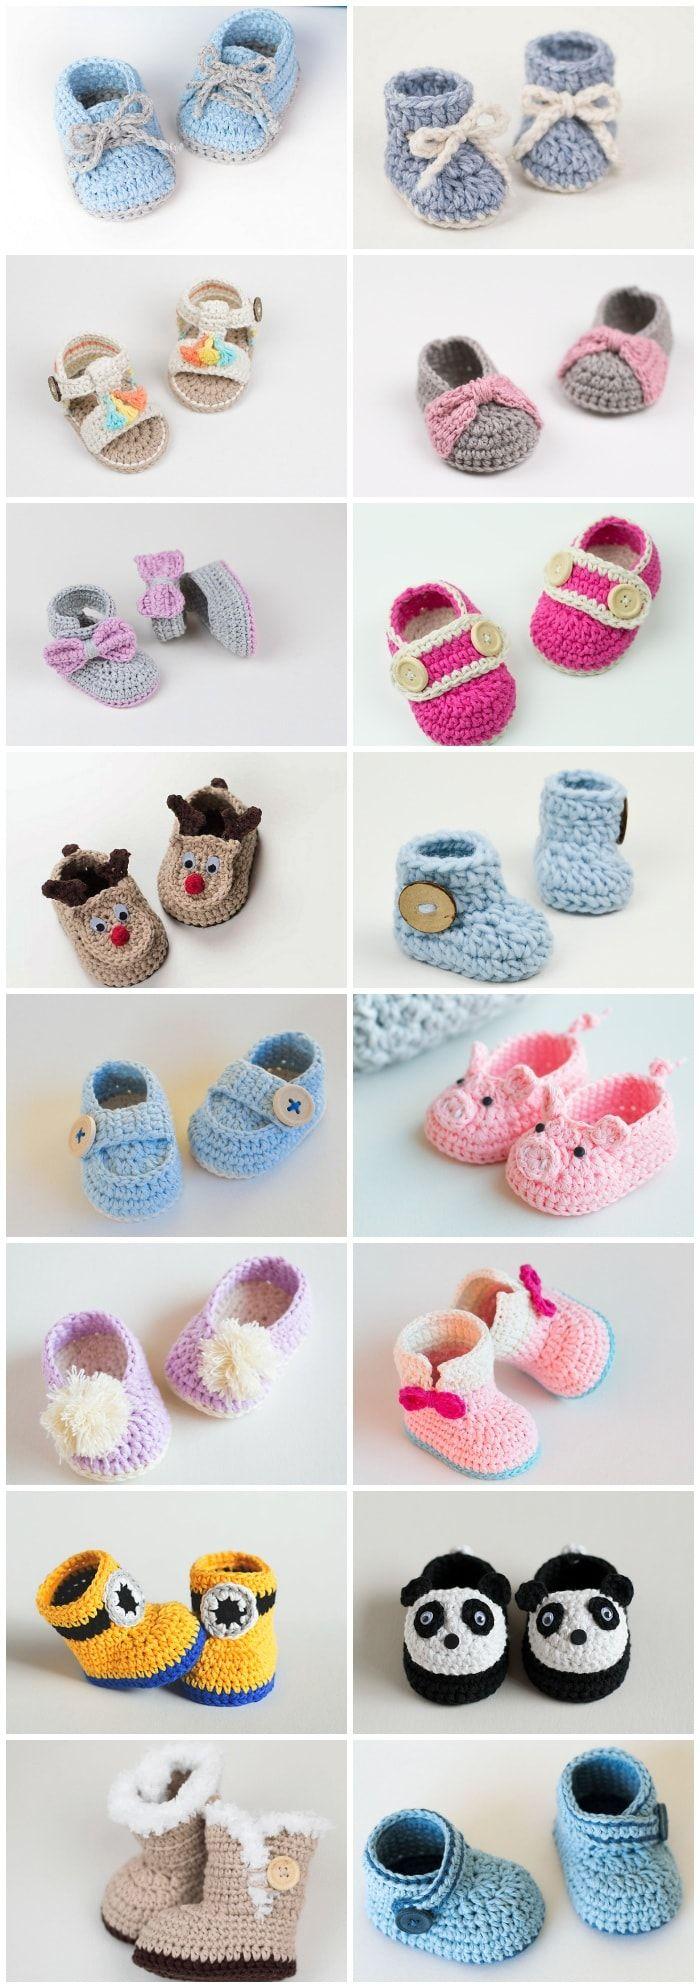 16 Free Crochet Baby Booties – Crochet Kingdom